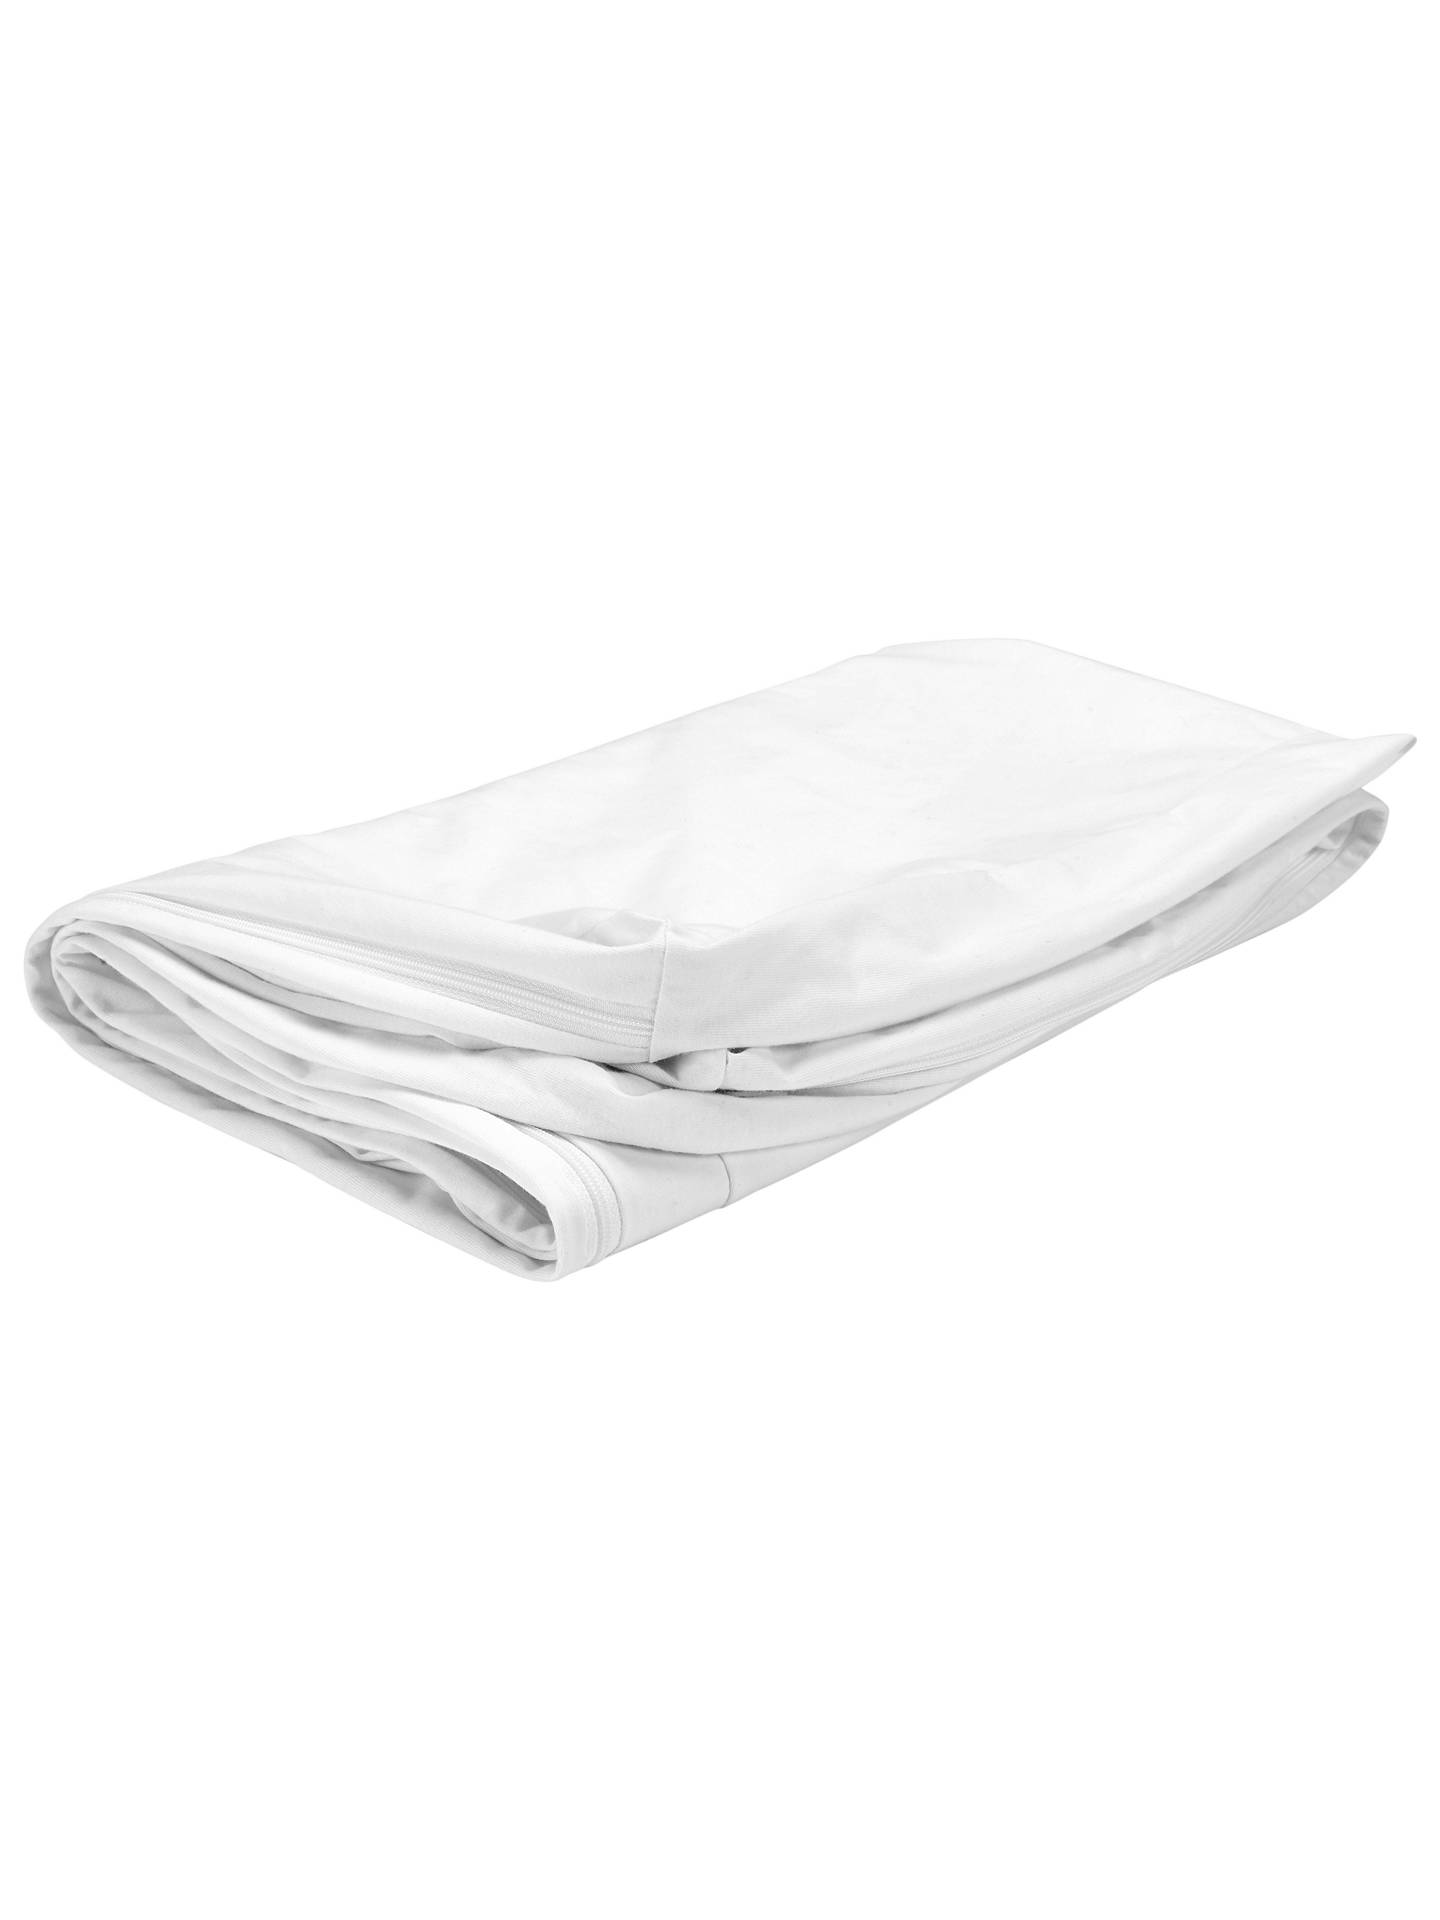 reputable site 60b26 bf5a7 John Lewis & Partners Micro-Fresh Cotton Cot Mattress Protector, White